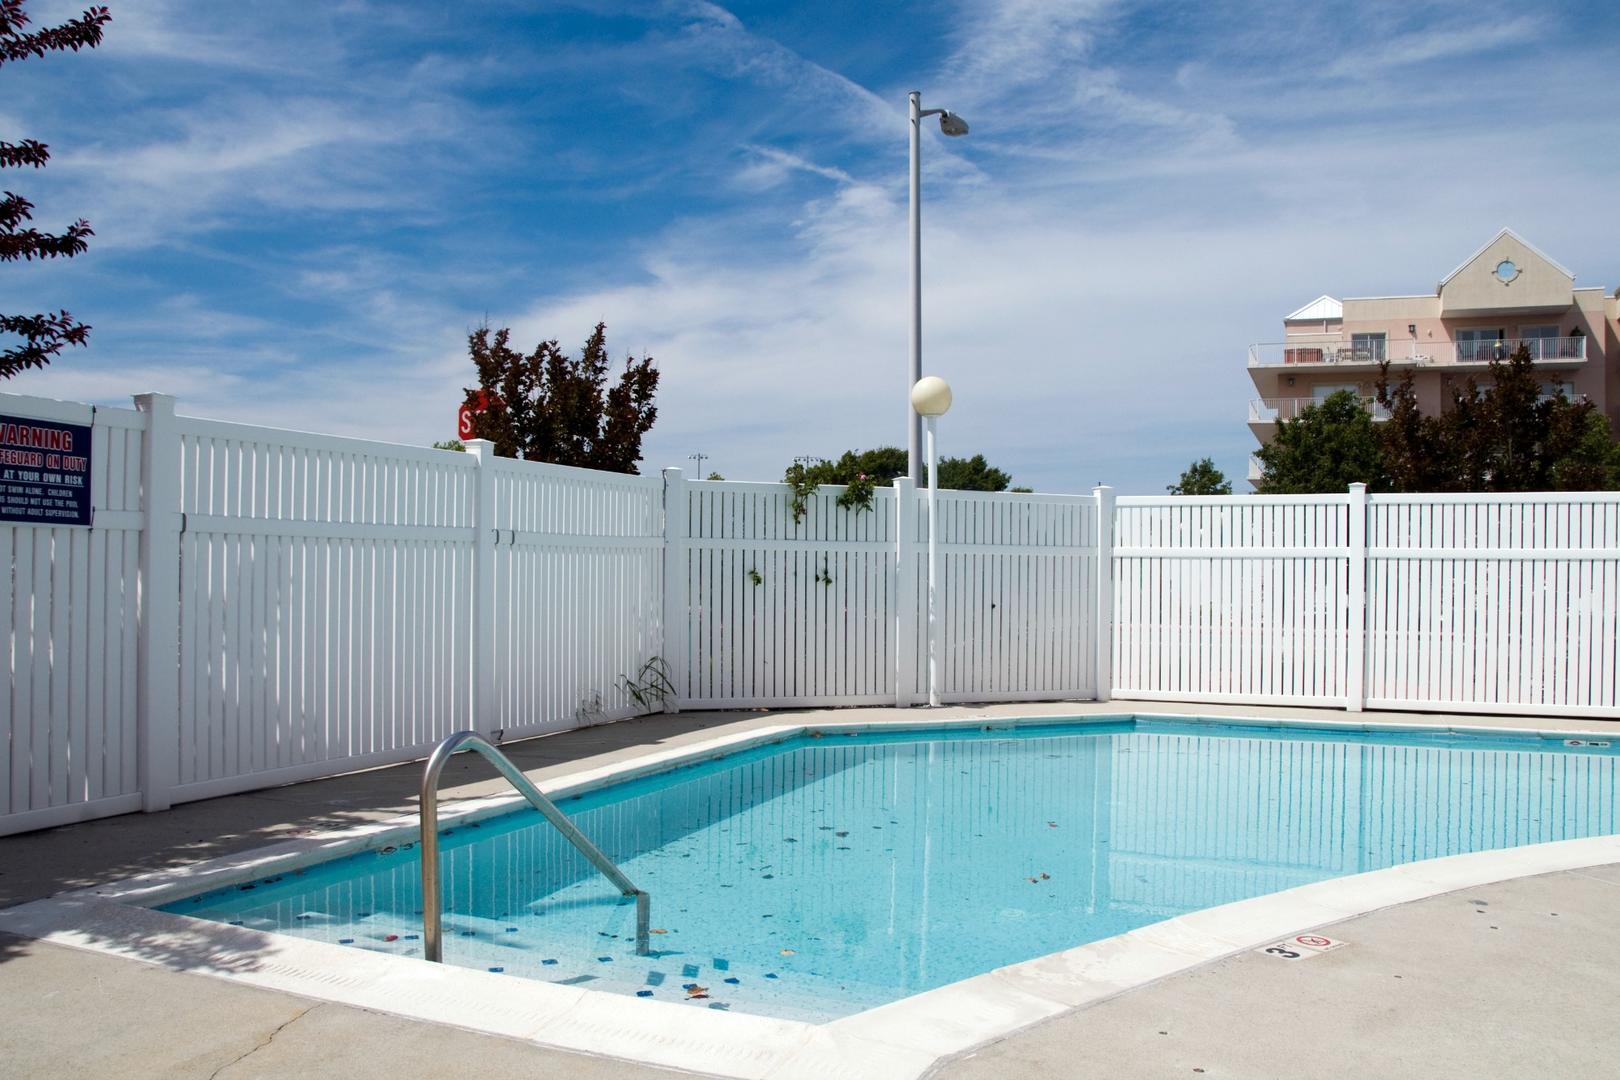 Lorelei I - Outdoor Pool